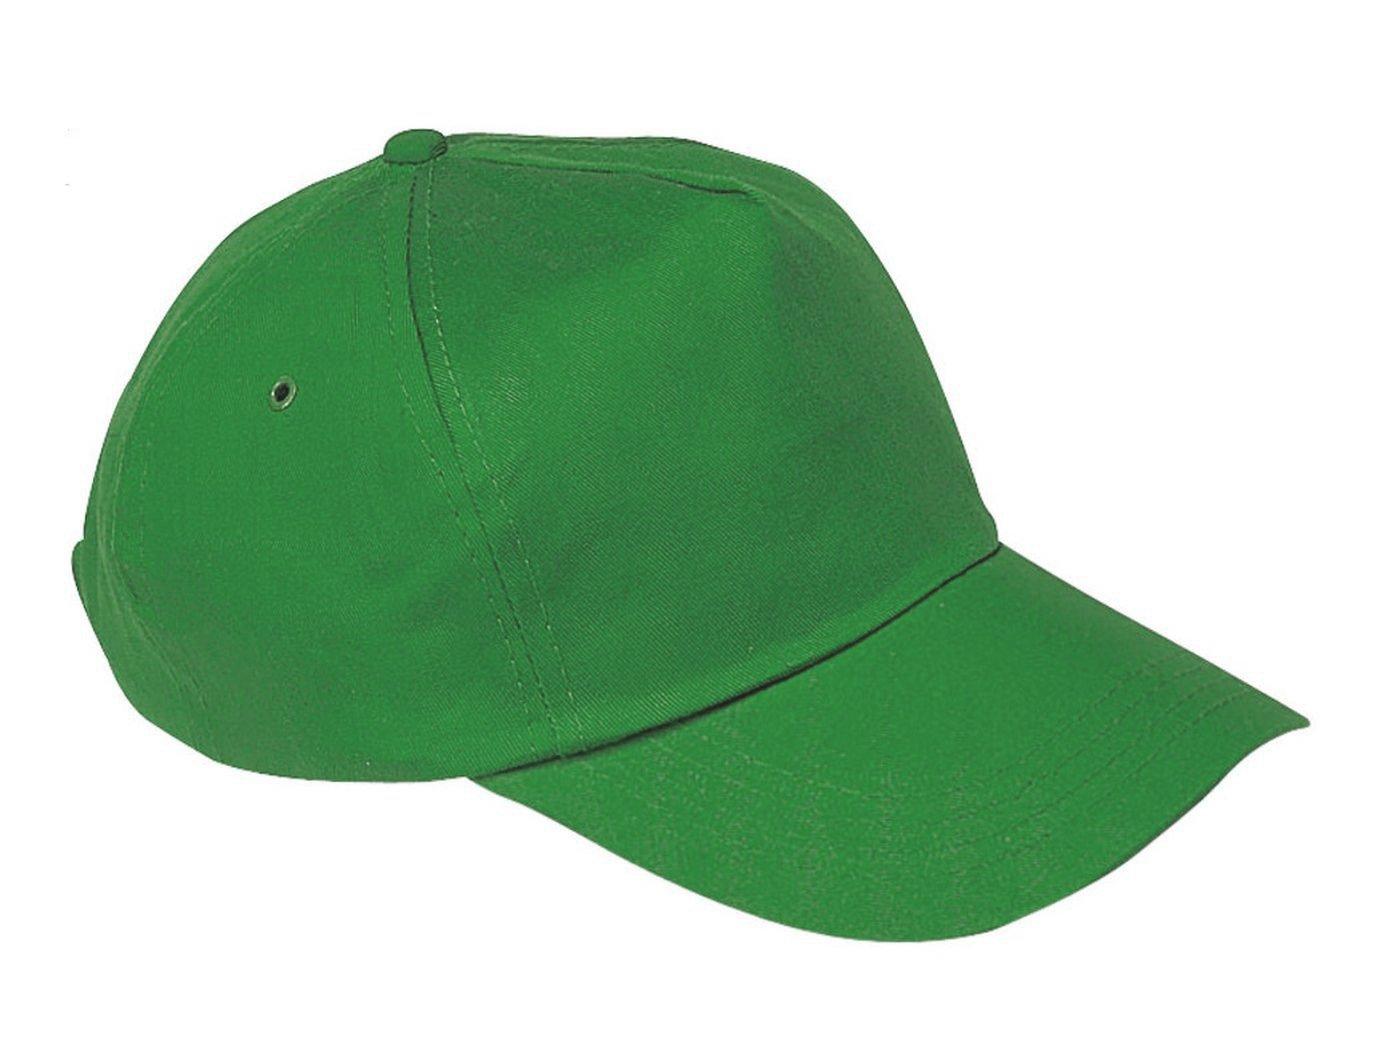 Gorra de béisbol para niño a talla unisex multicolor verde Regular